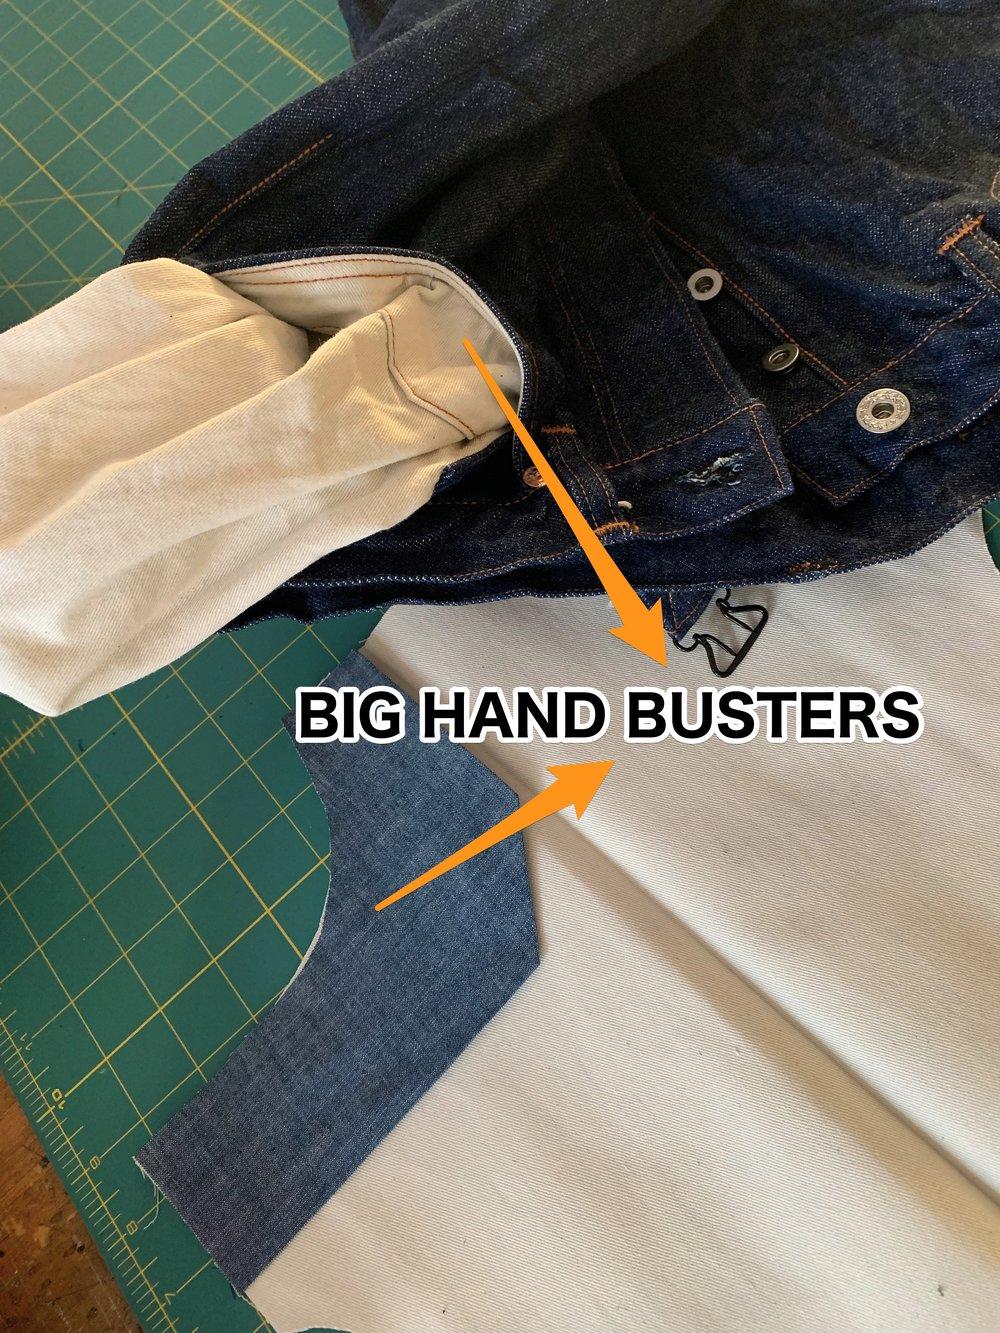 Reinforcement Fabric inside of hand pockets